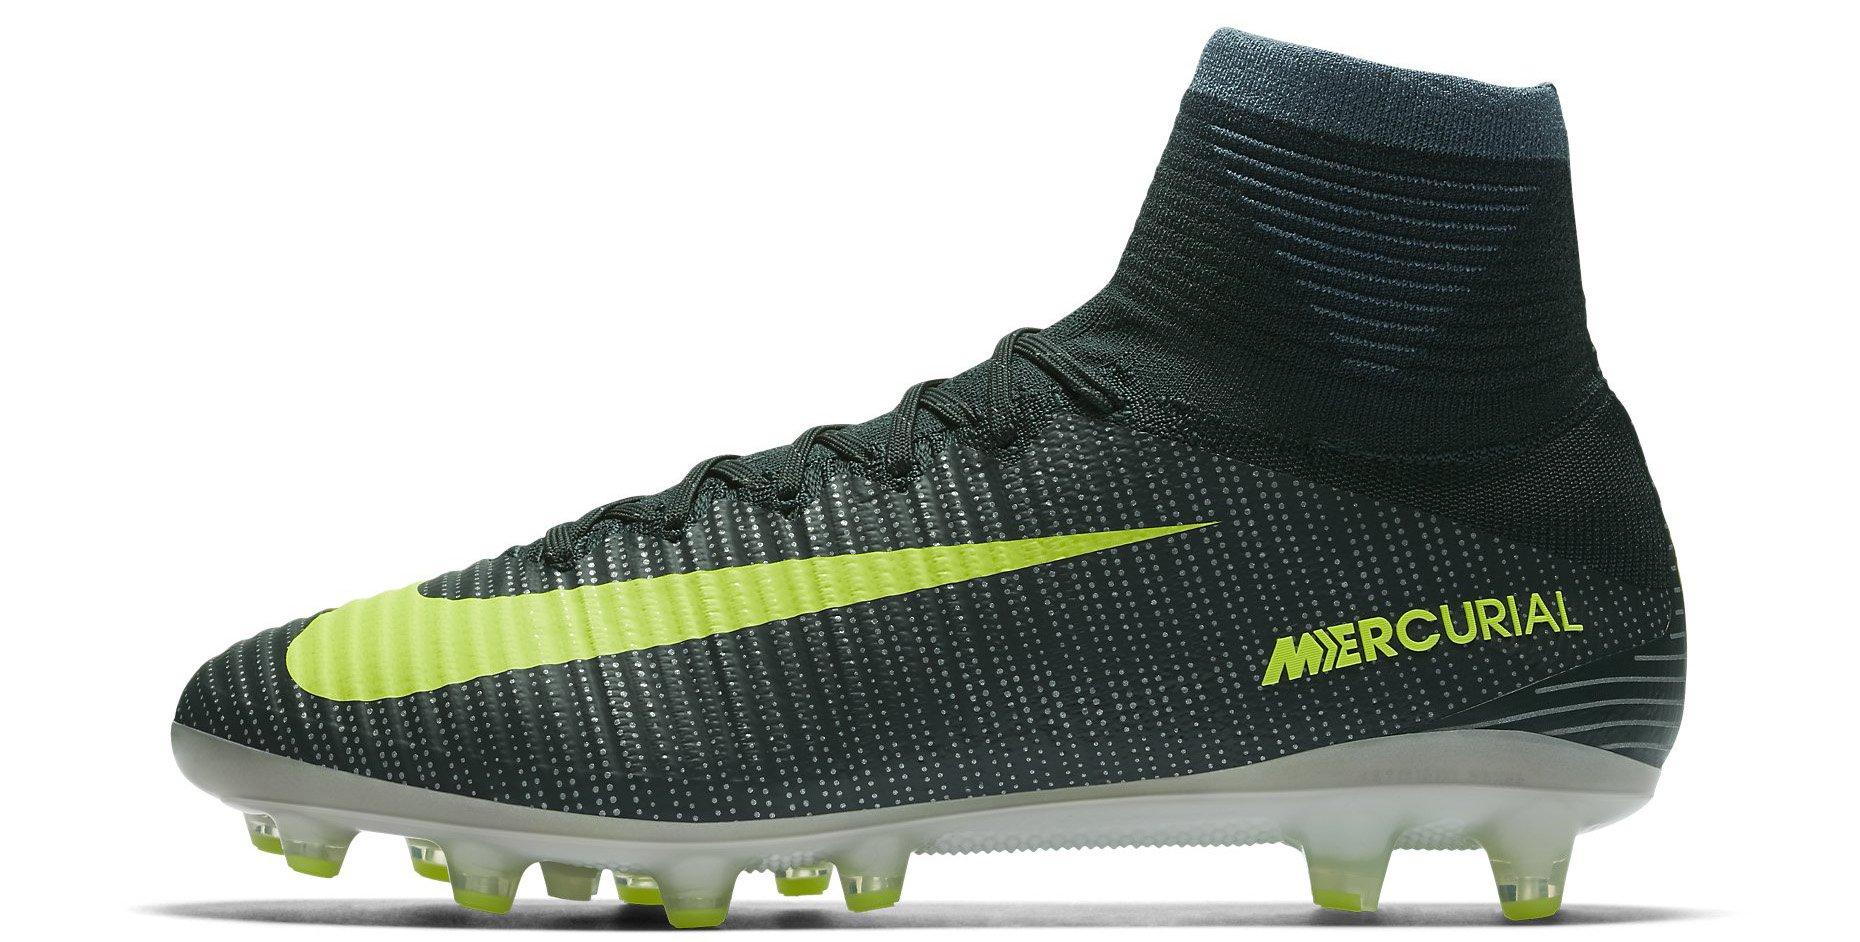 CR 7 New Nike Mercurial Superfly V FG football boots